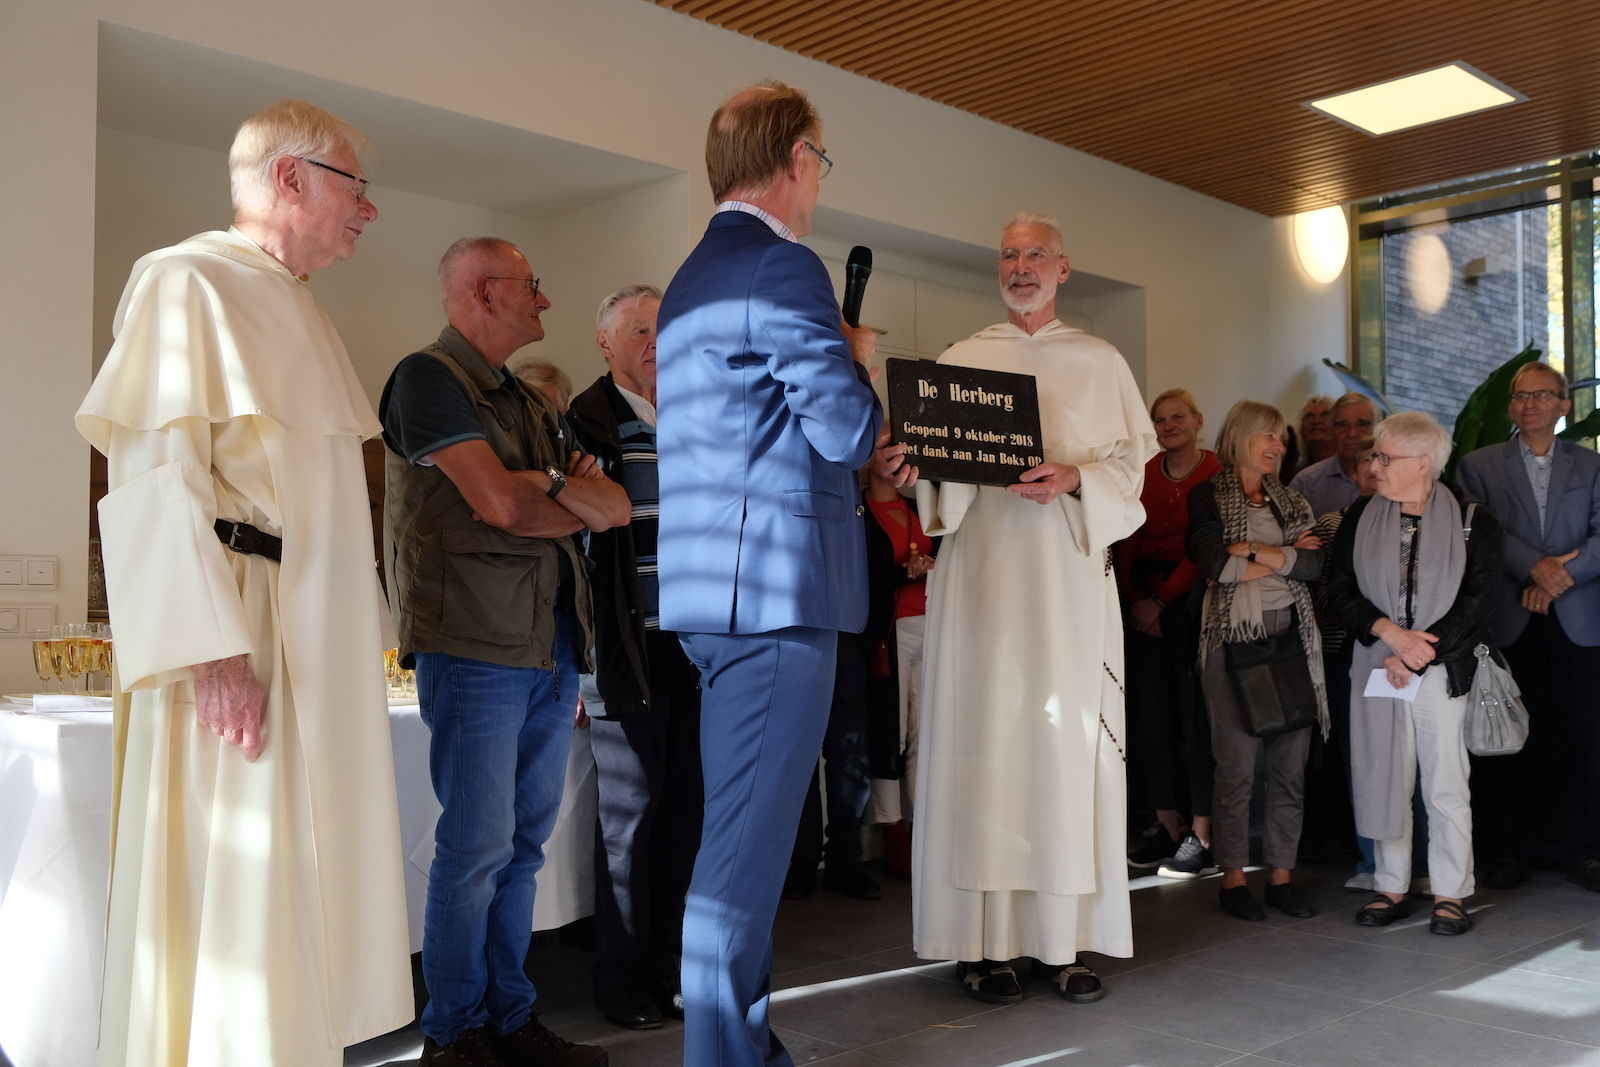 opening herberg huissen 9 okt 2018 jan boks klein